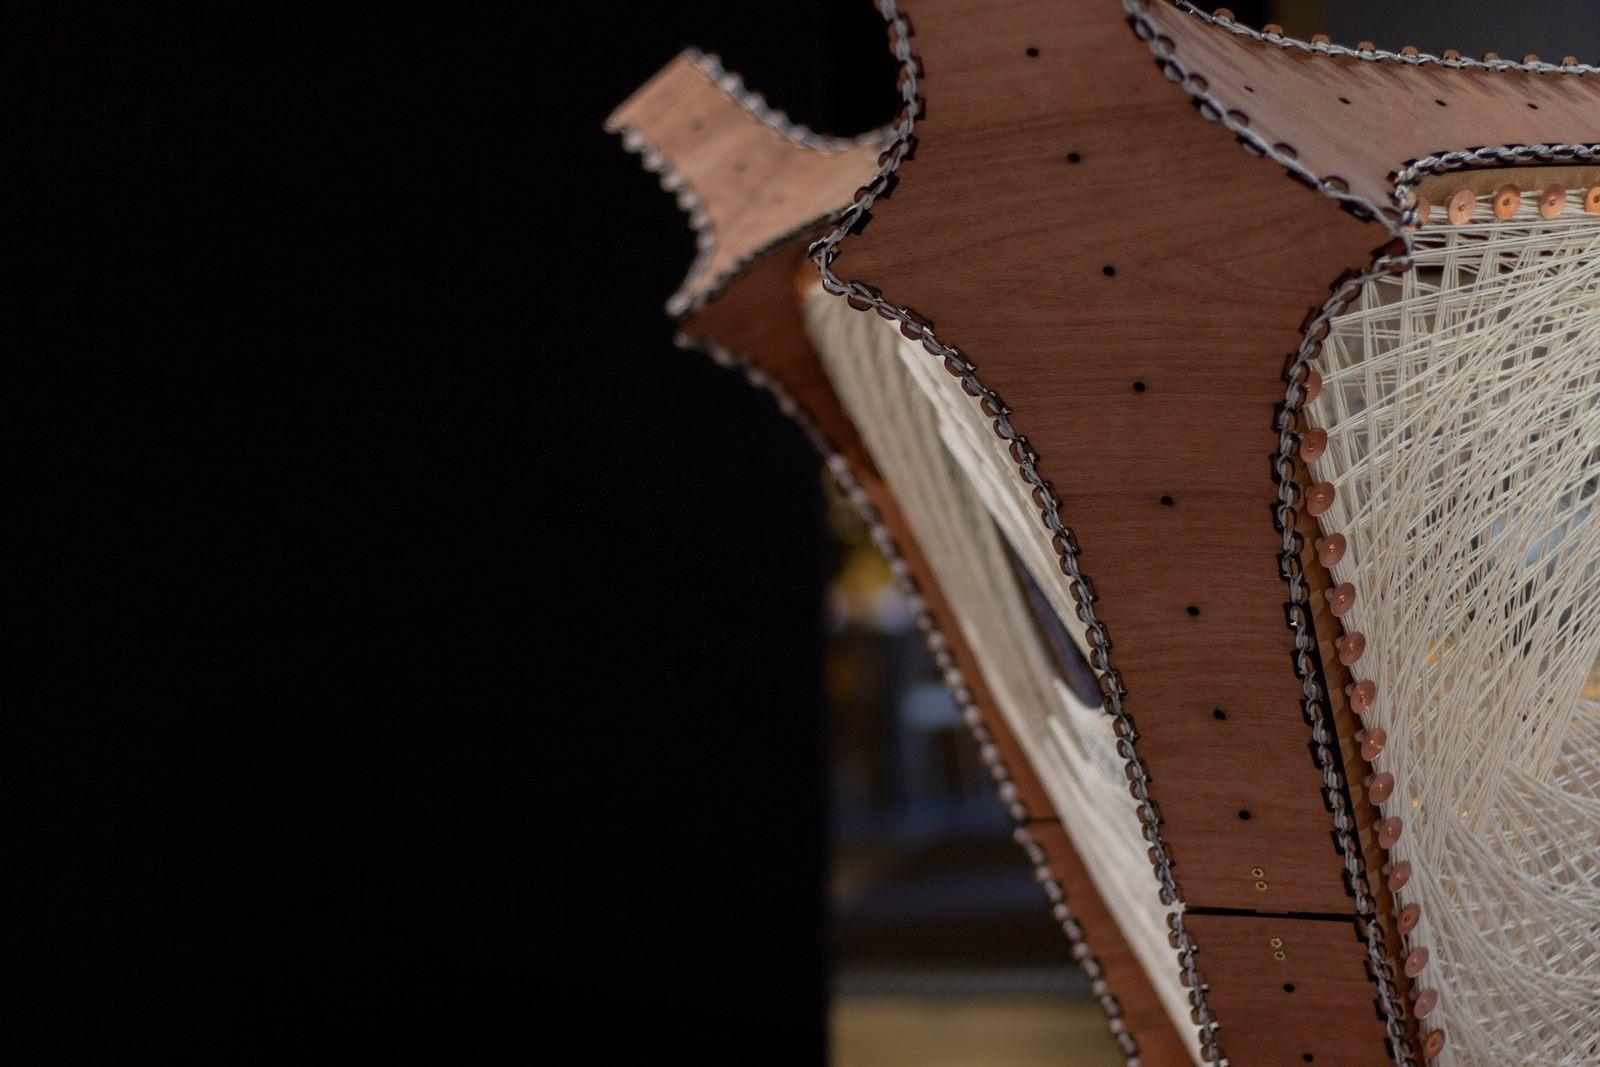 08_Bent wood and robotically woven fibre prototype_Digital Turn_The Building Centre_-¬Chris Jackson (Copiar)